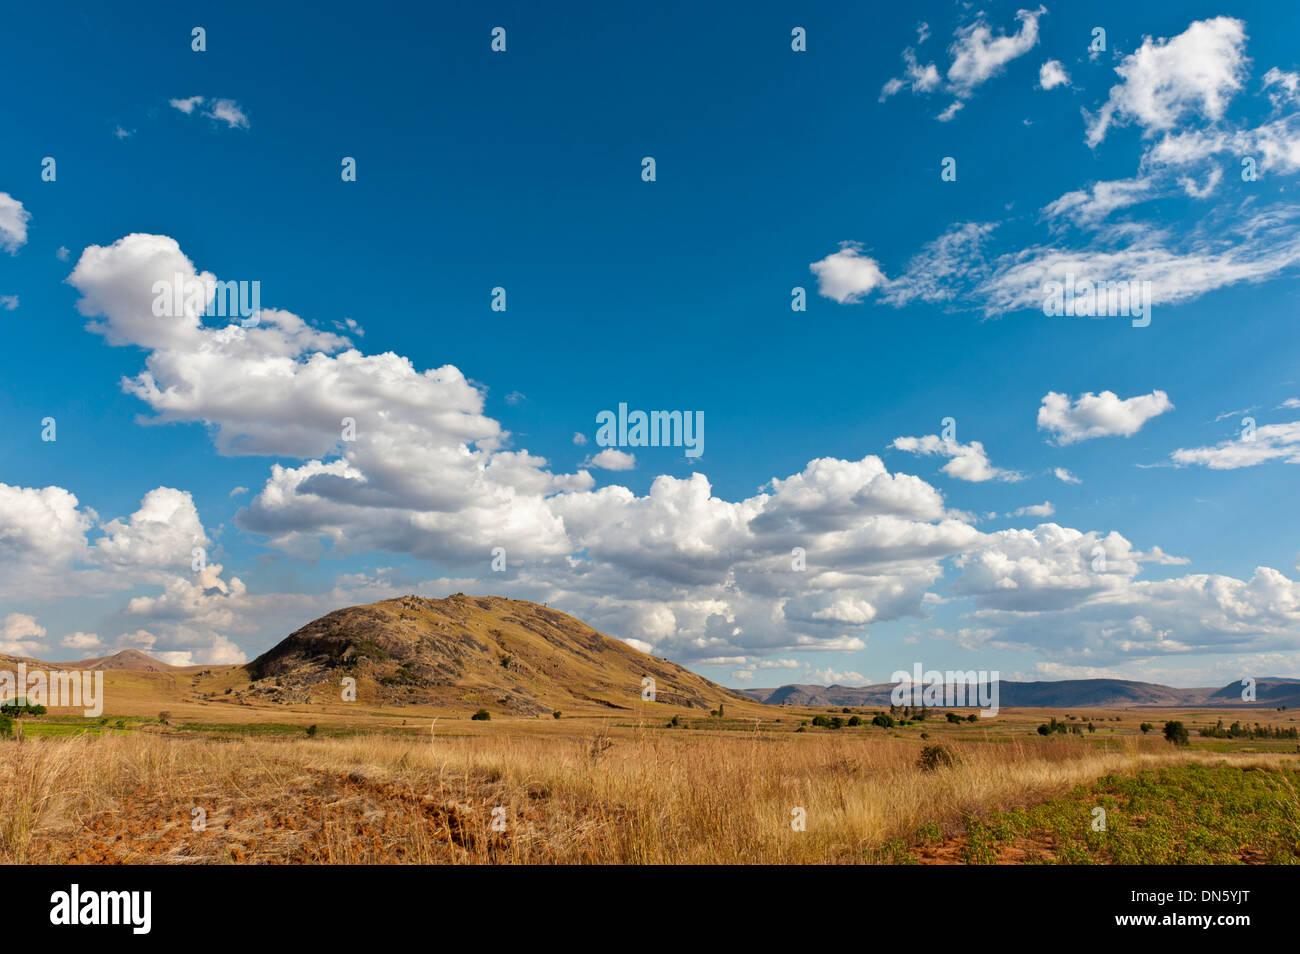 Vast arid landscape, blue sky with clouds, Isalo National Park near Ranohira, Madagascar Stock Photo